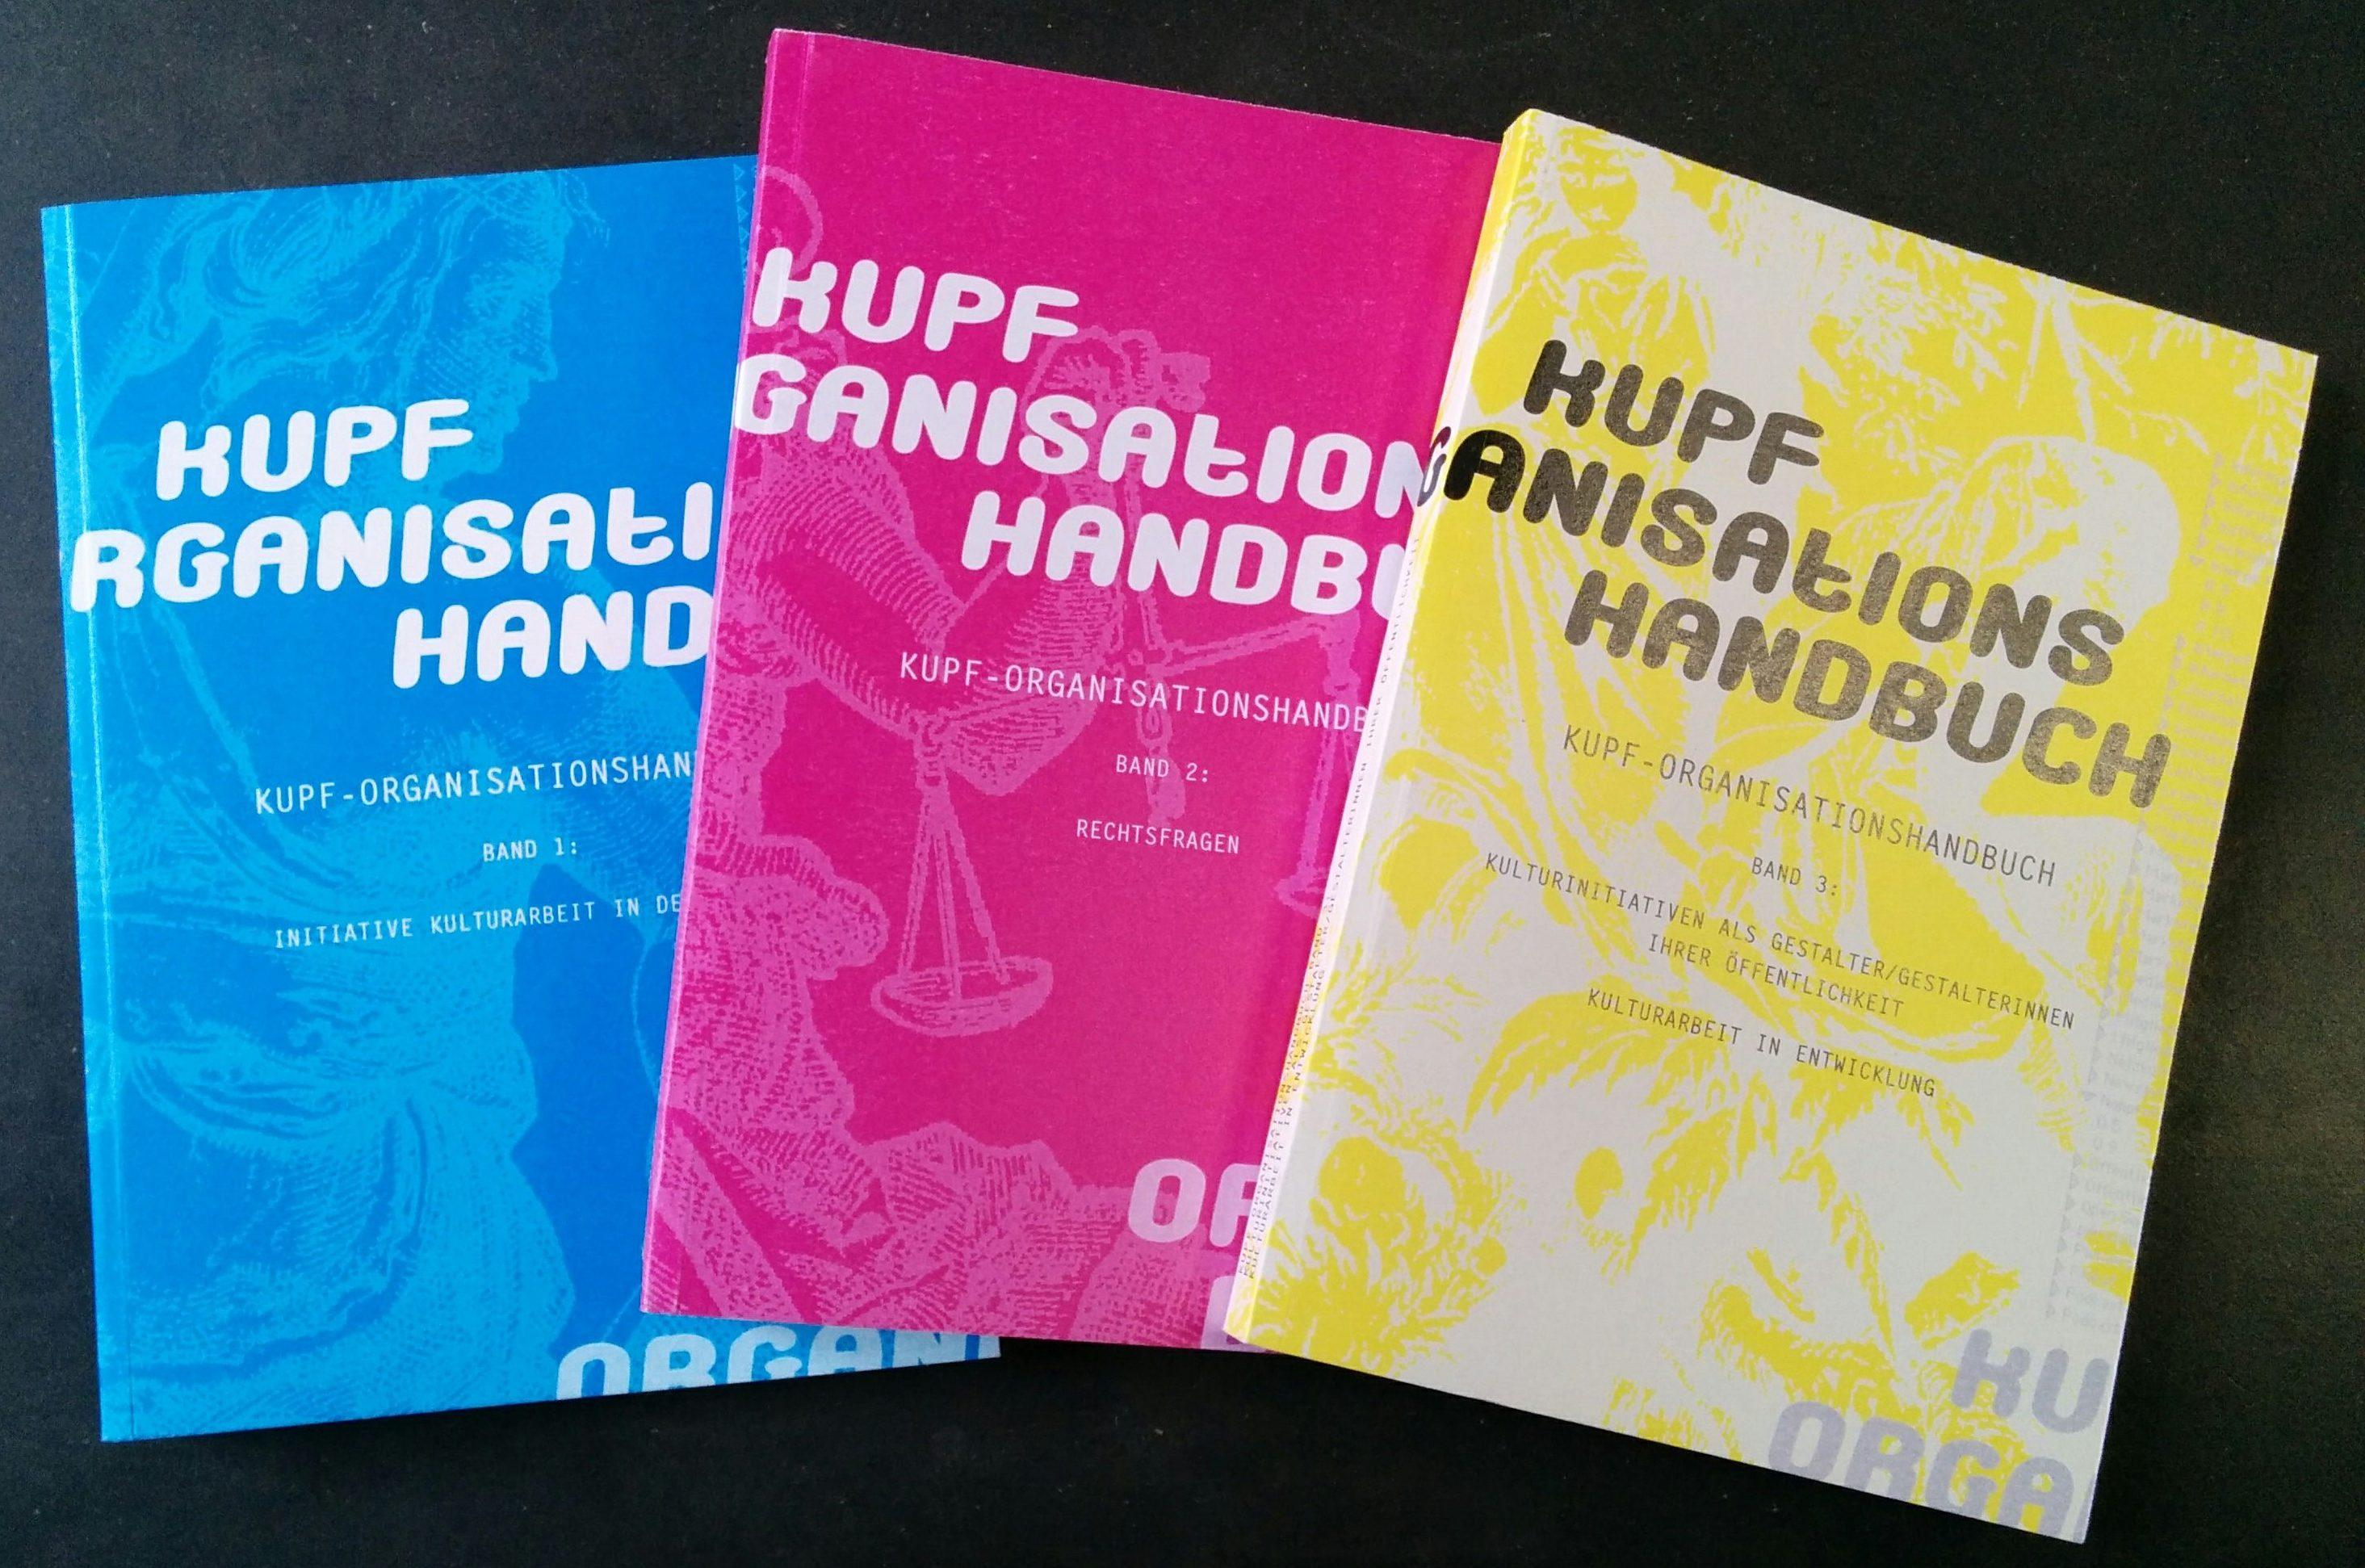 organisationshandbuch aufbau